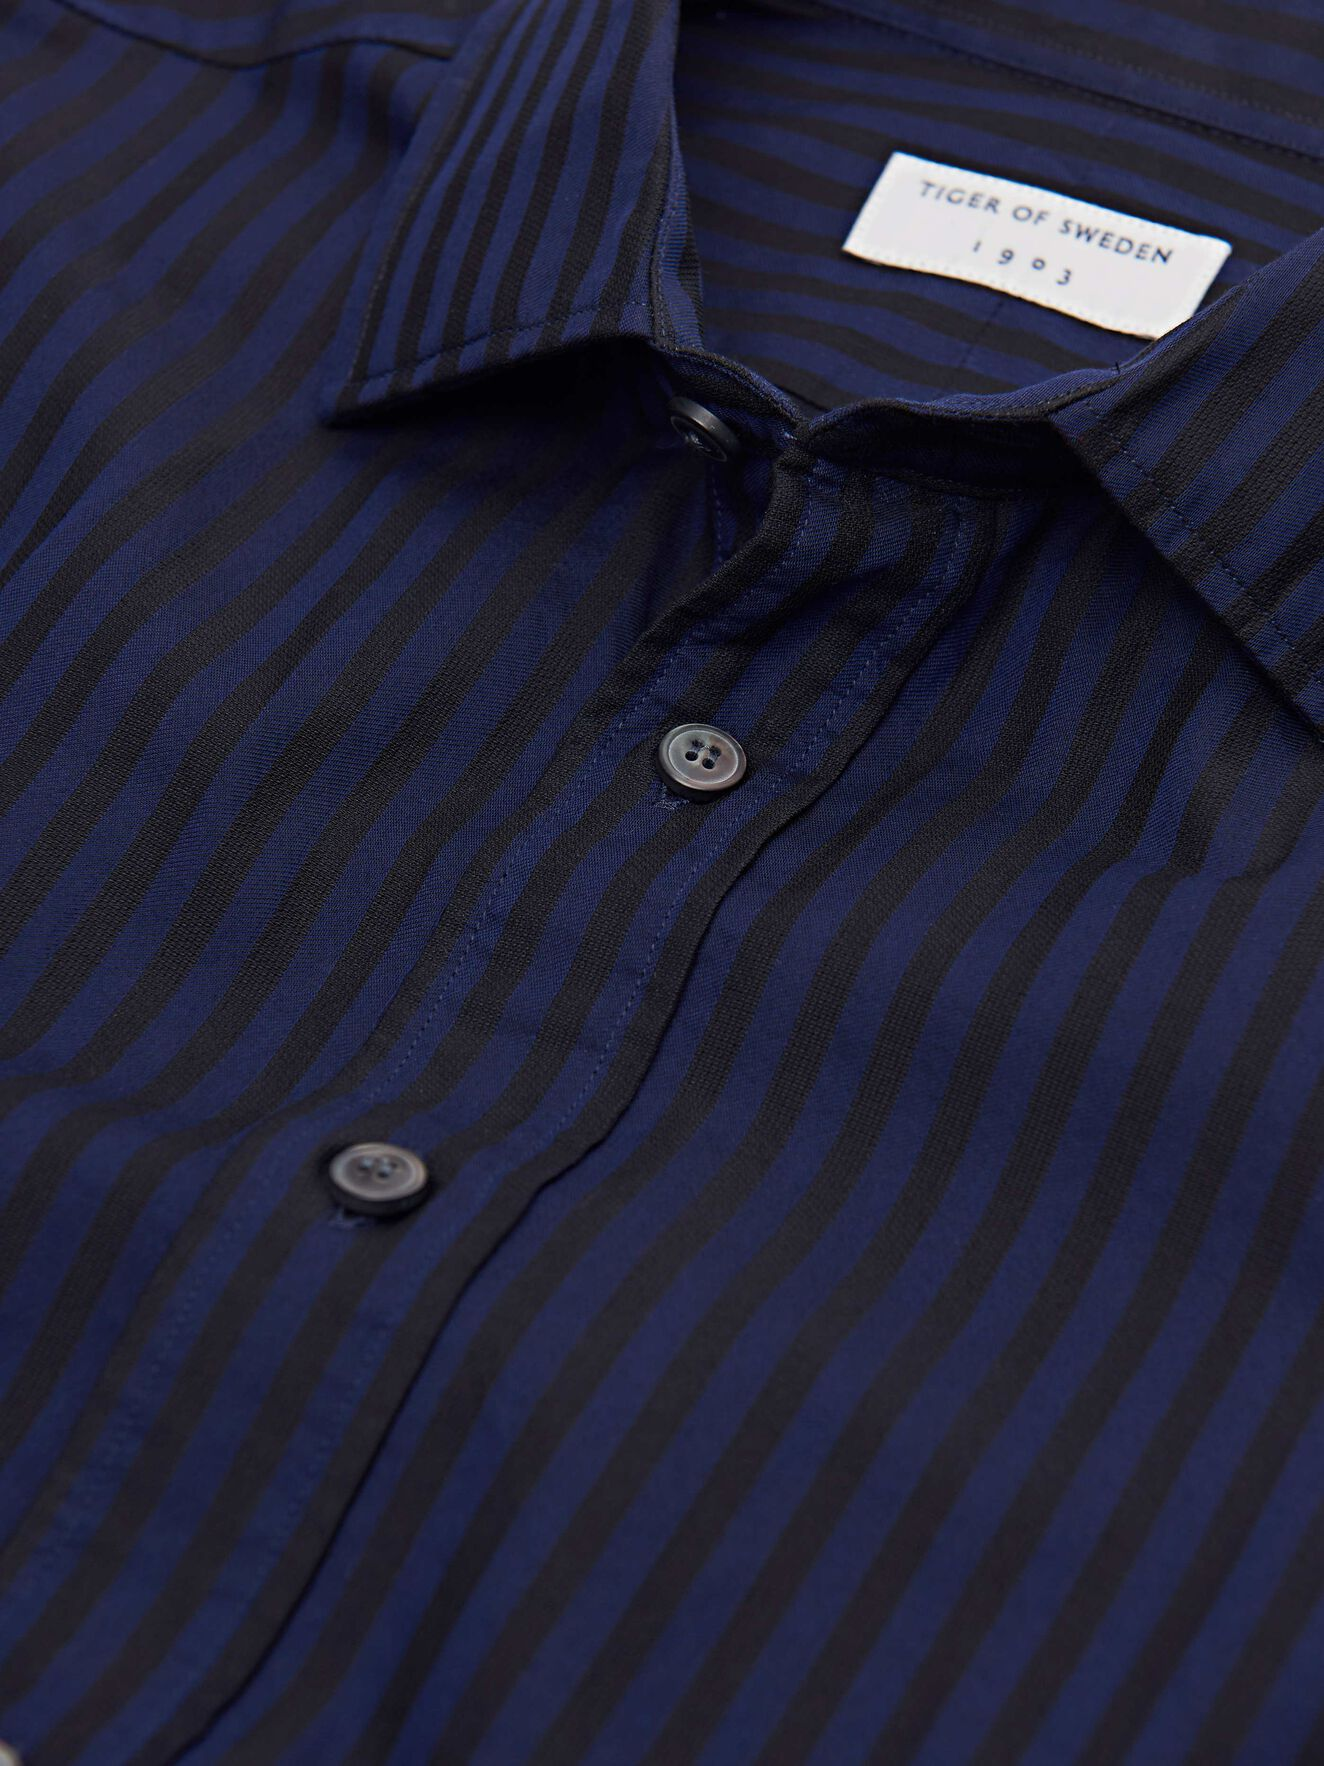 Fridolf Shirt in Light Ink from Tiger of Sweden